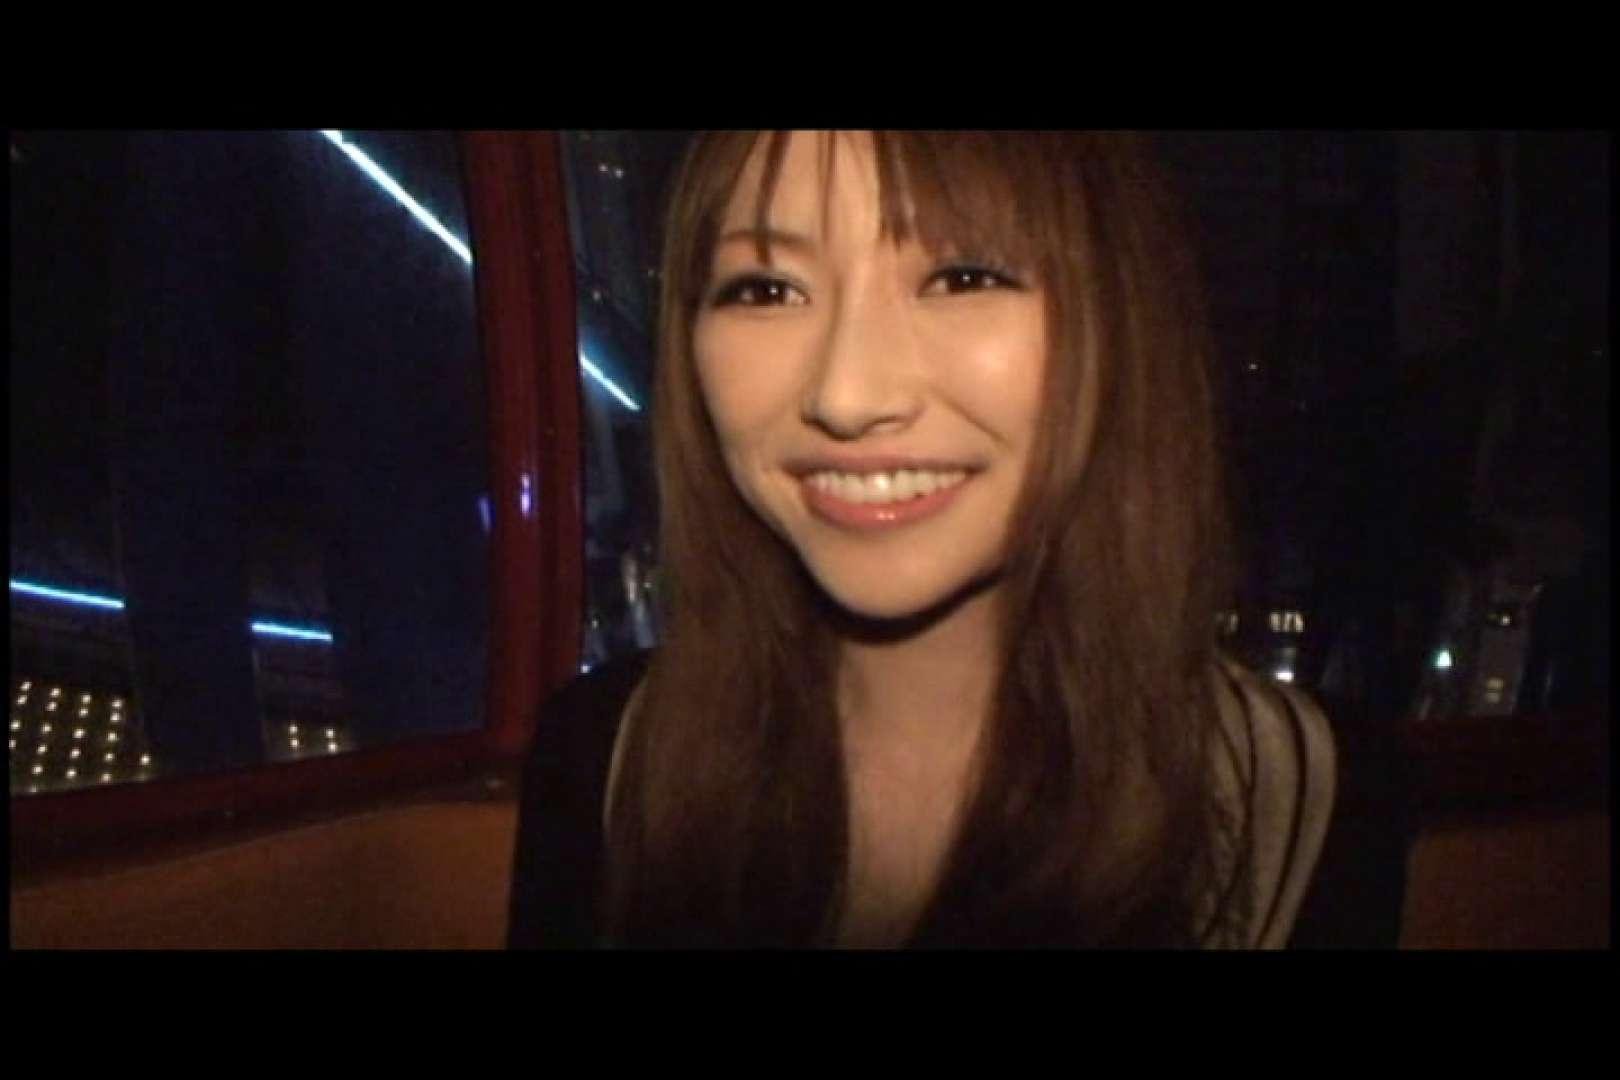 JDハンター全国ツアー vol.058 後編 女子大生のエロ動画  106PIX 4